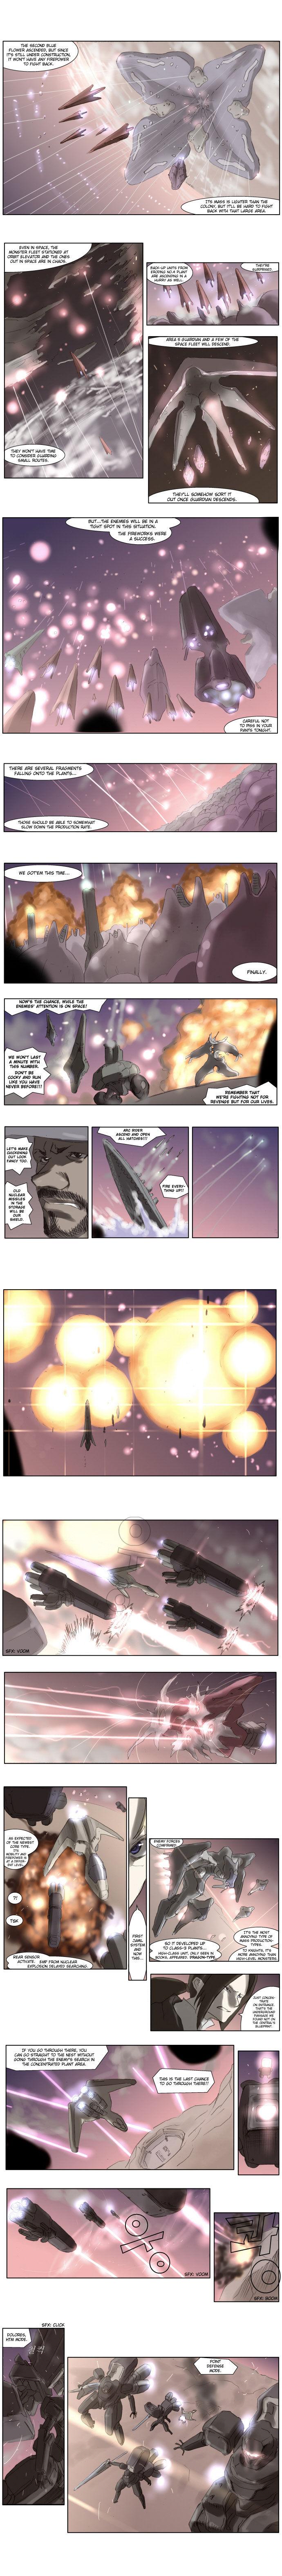 Knight Run 47 Page 3